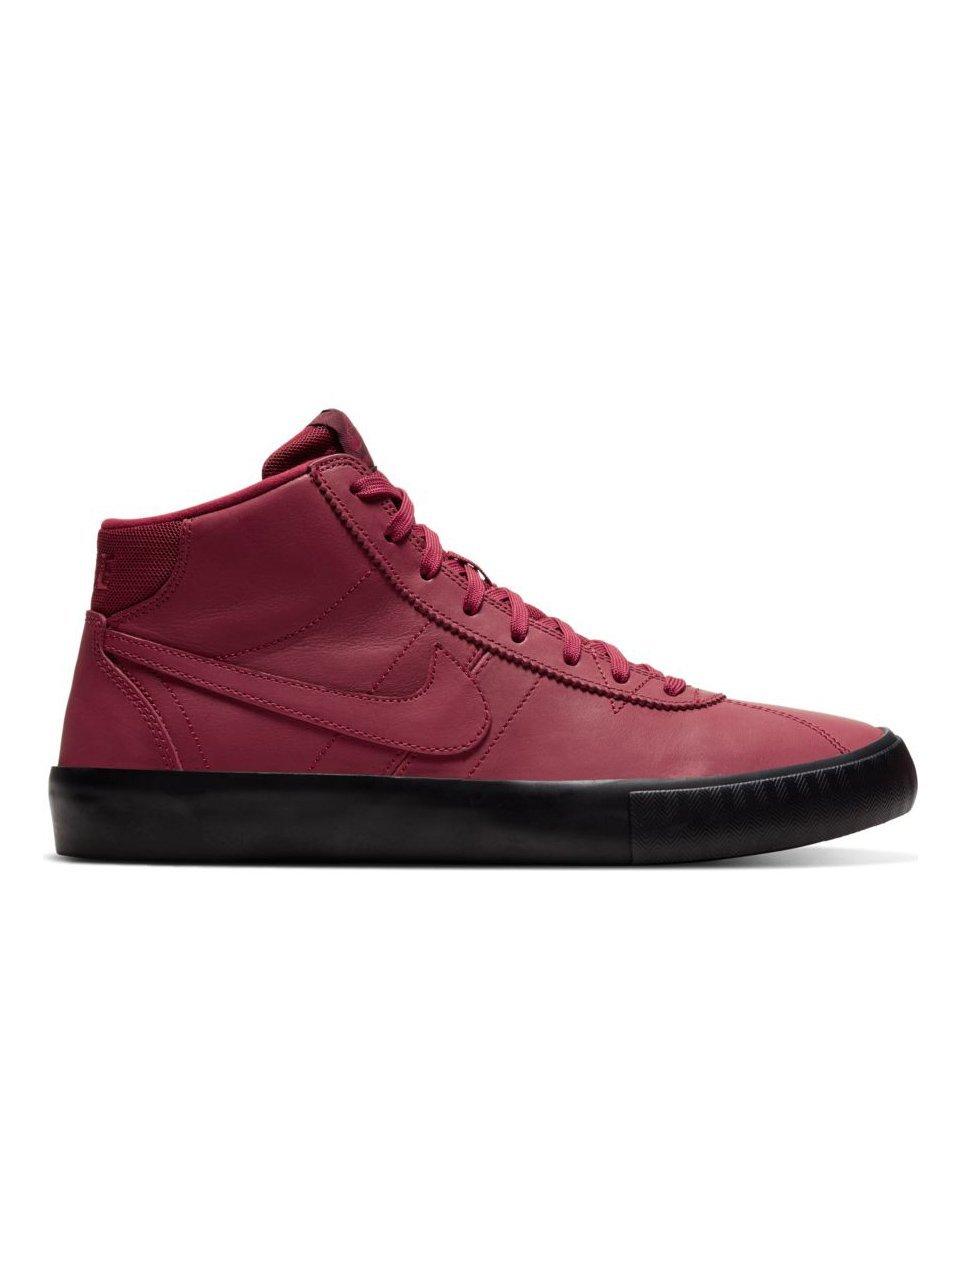 Nike SB Bruin HI ISO Team Red/Night Maroon